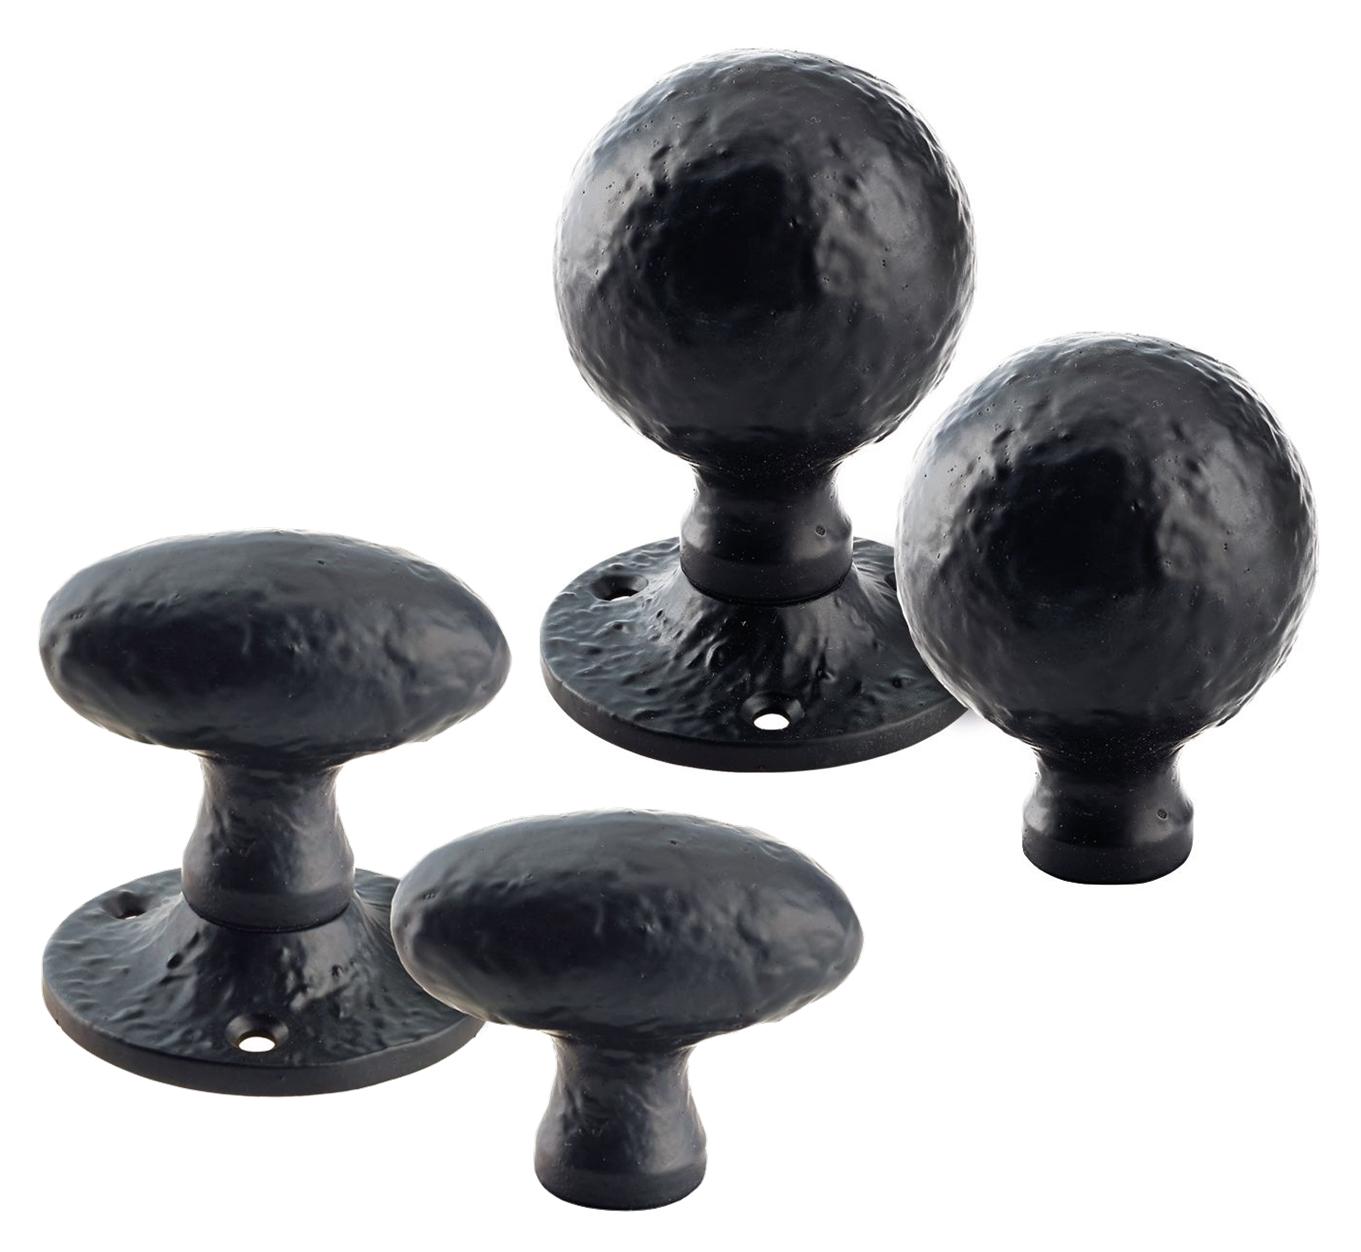 Black Antique Cast Wrought Iron Octagon Rim Mortice Knob Door Knobs Handles Set